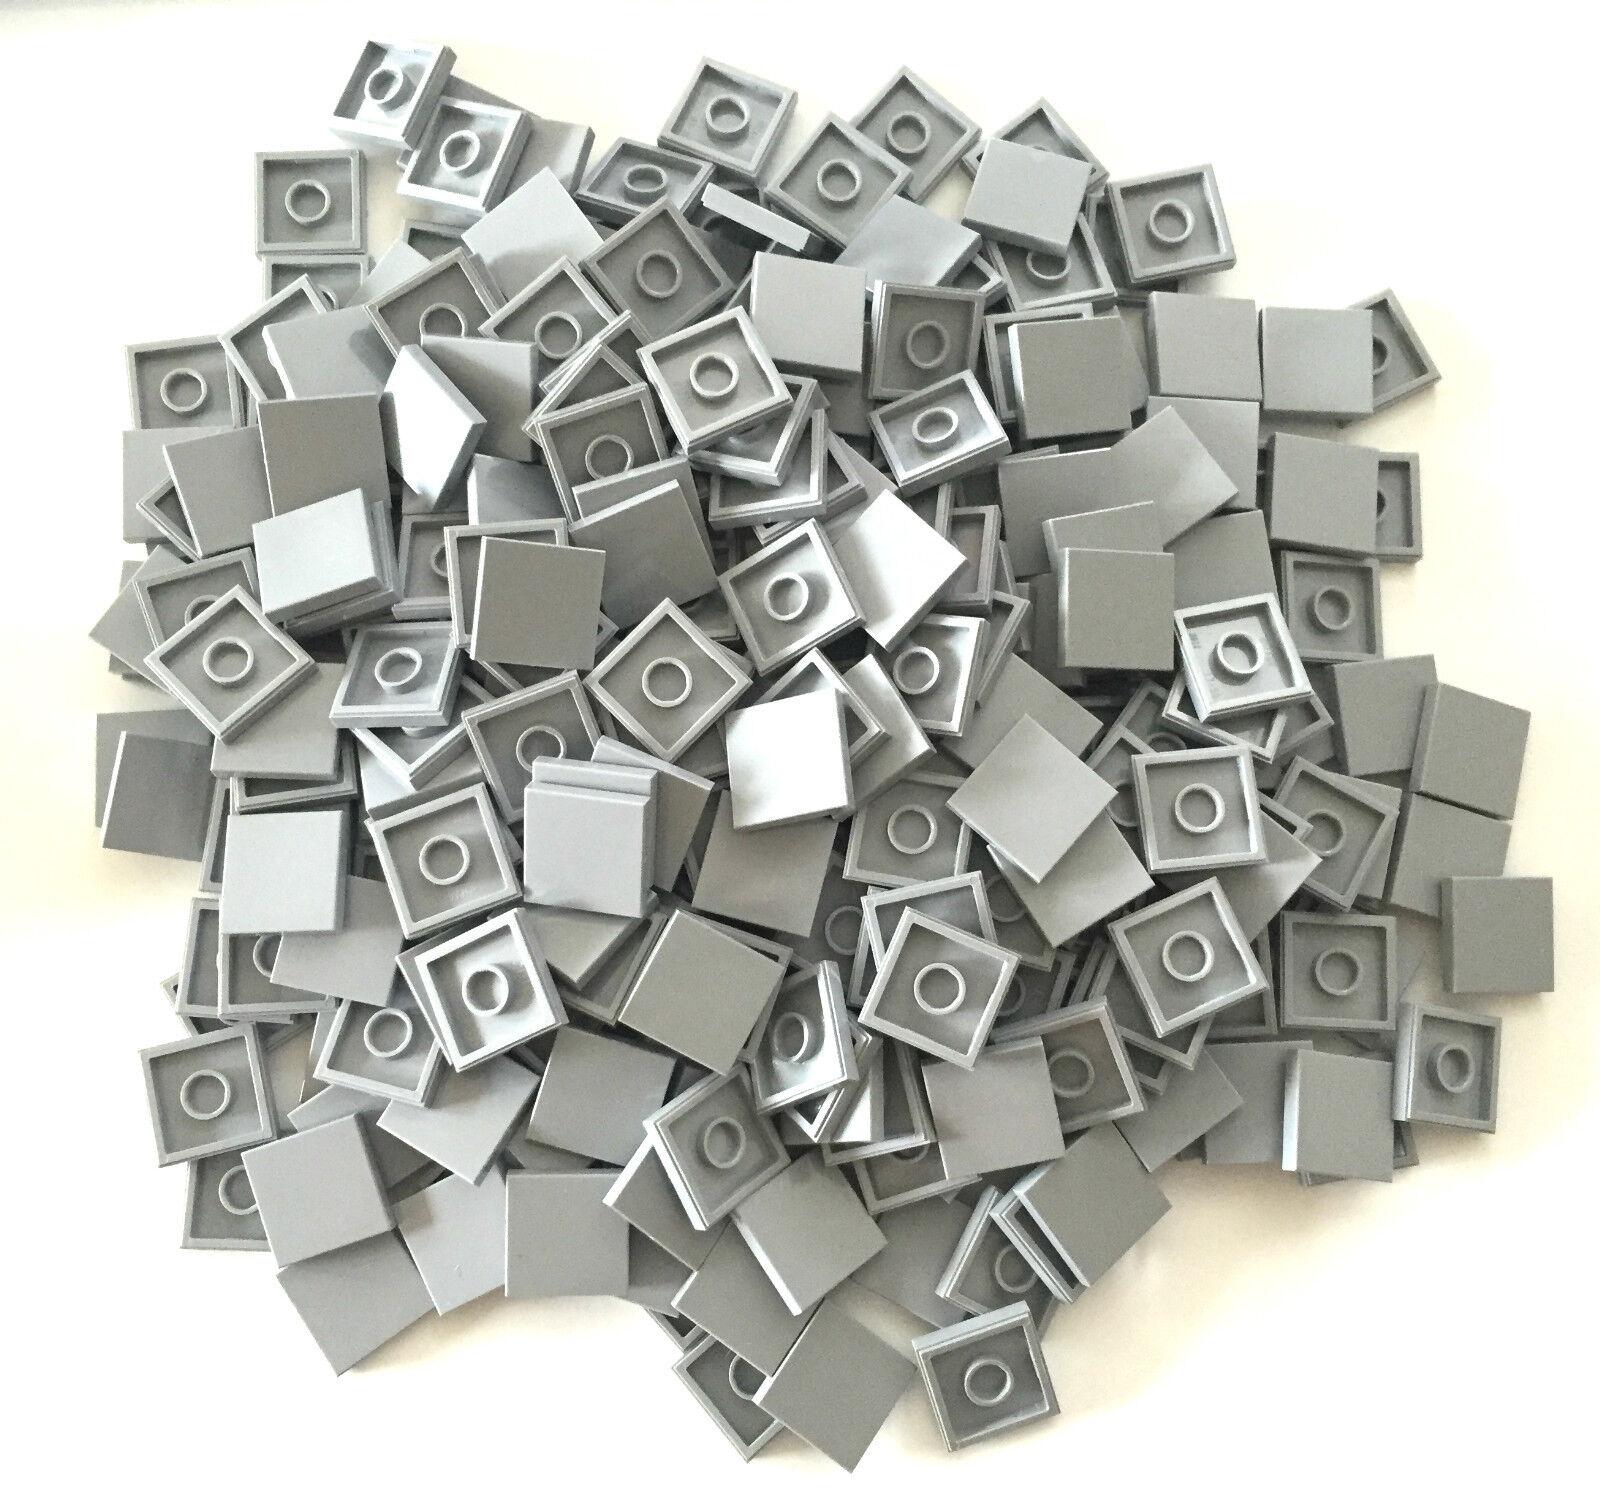 *NEW* 500 Pieces Lego SMOOTH TILE 2x2 BLUISH Gris *BULK* 3068